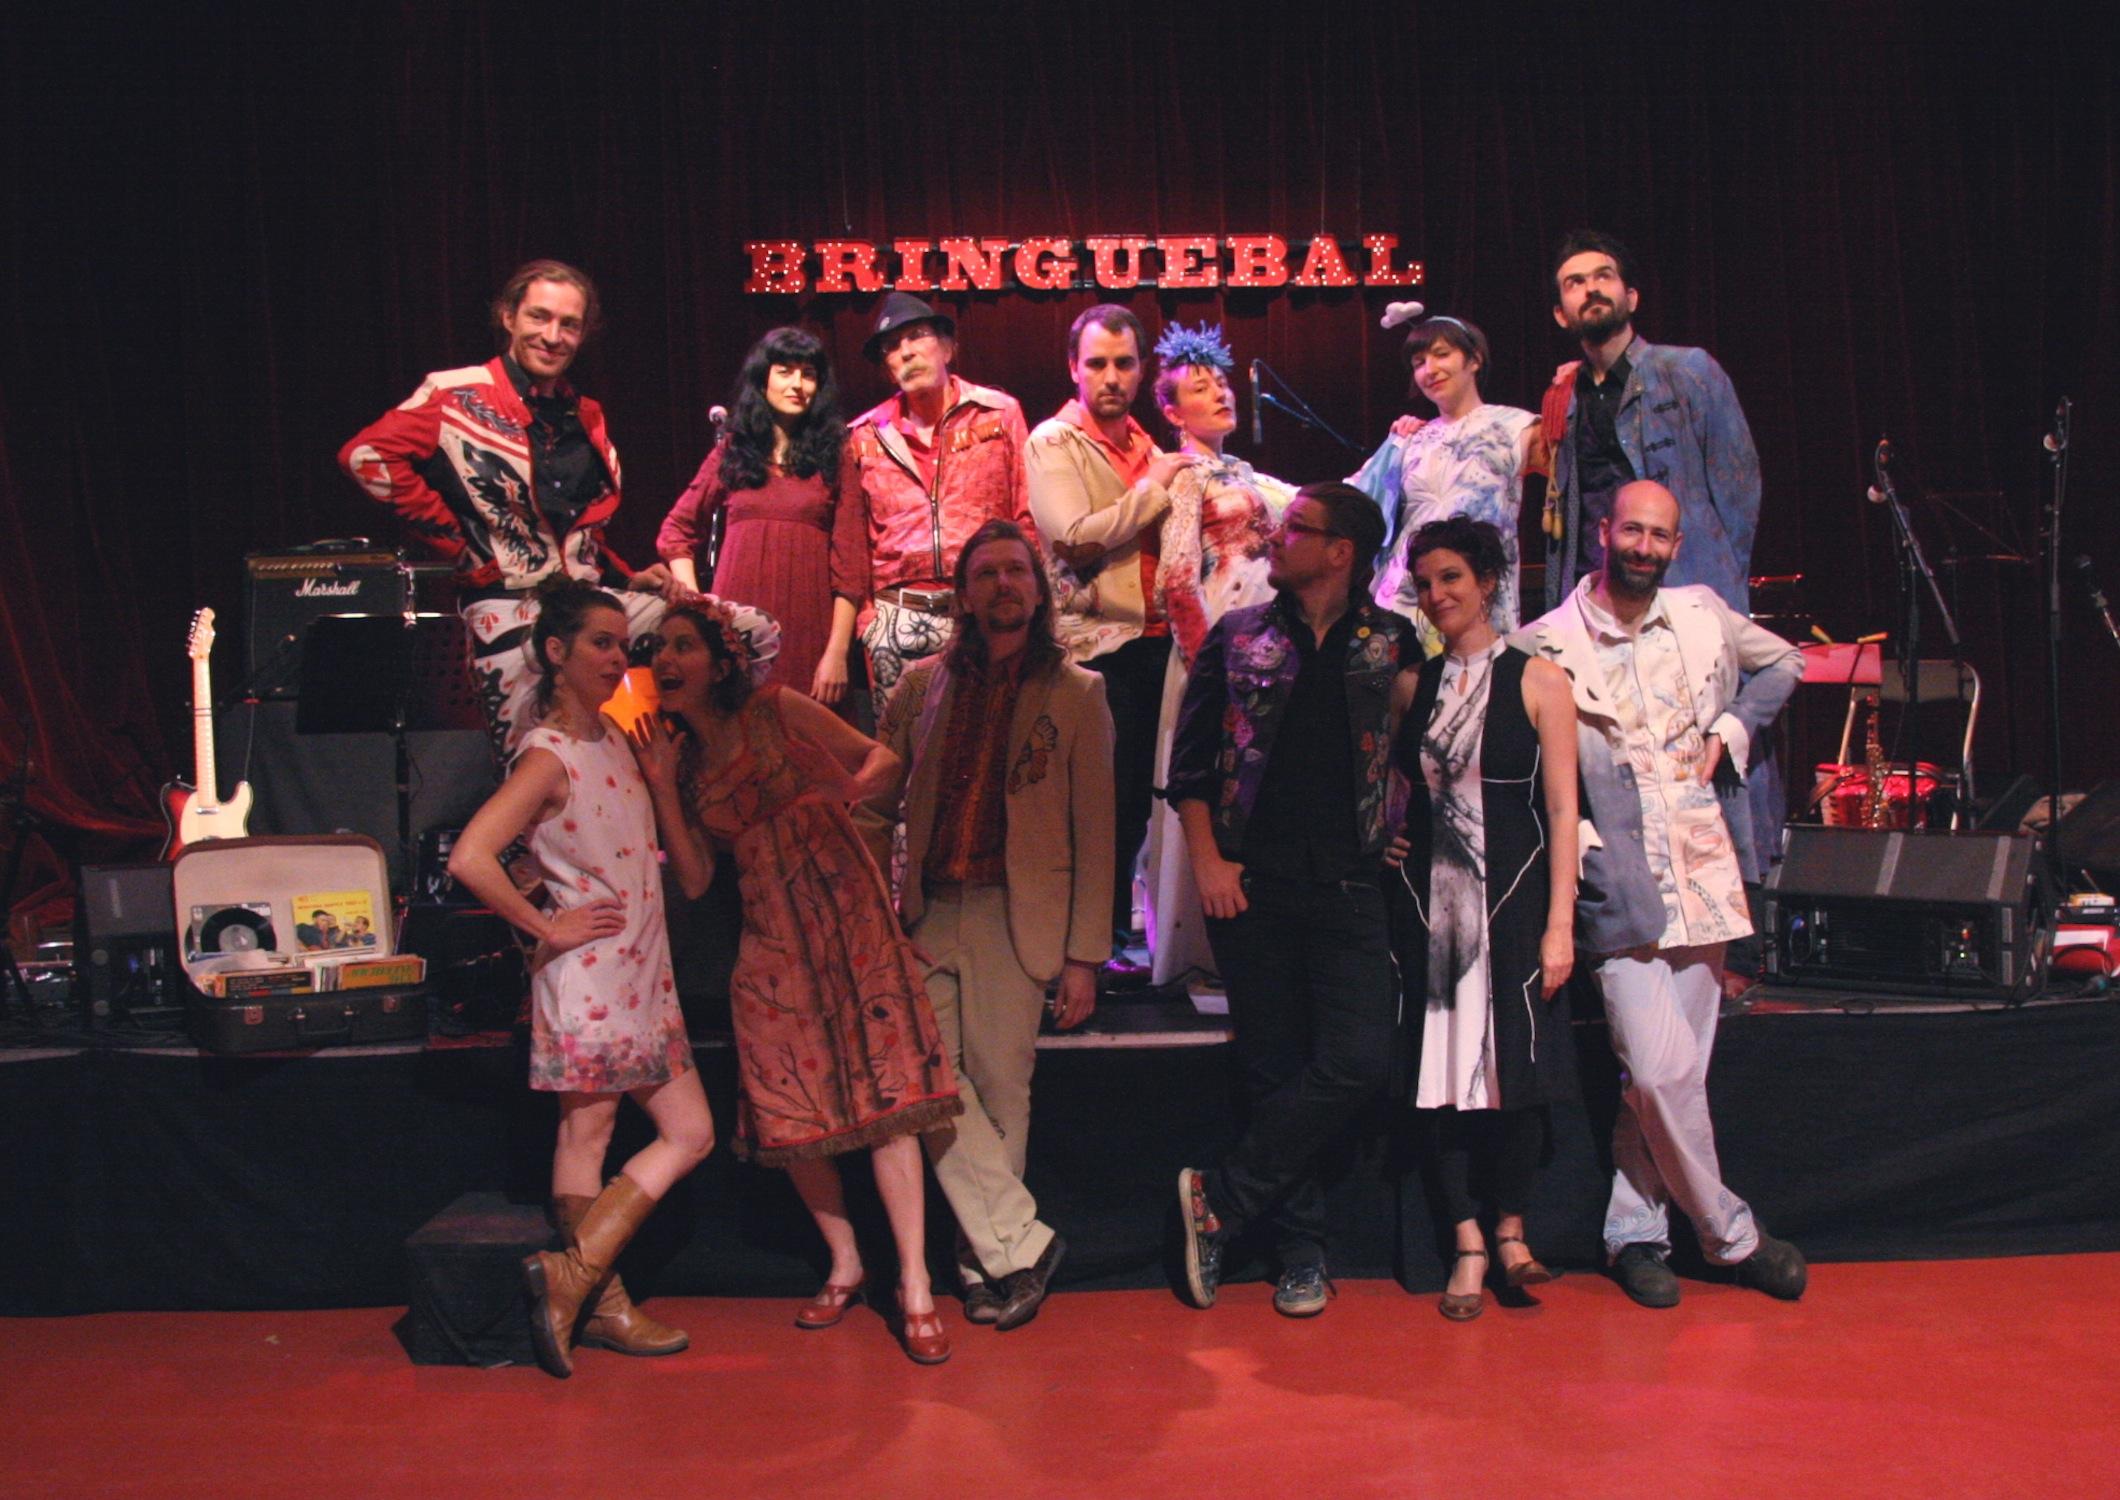 Le Bringuebal